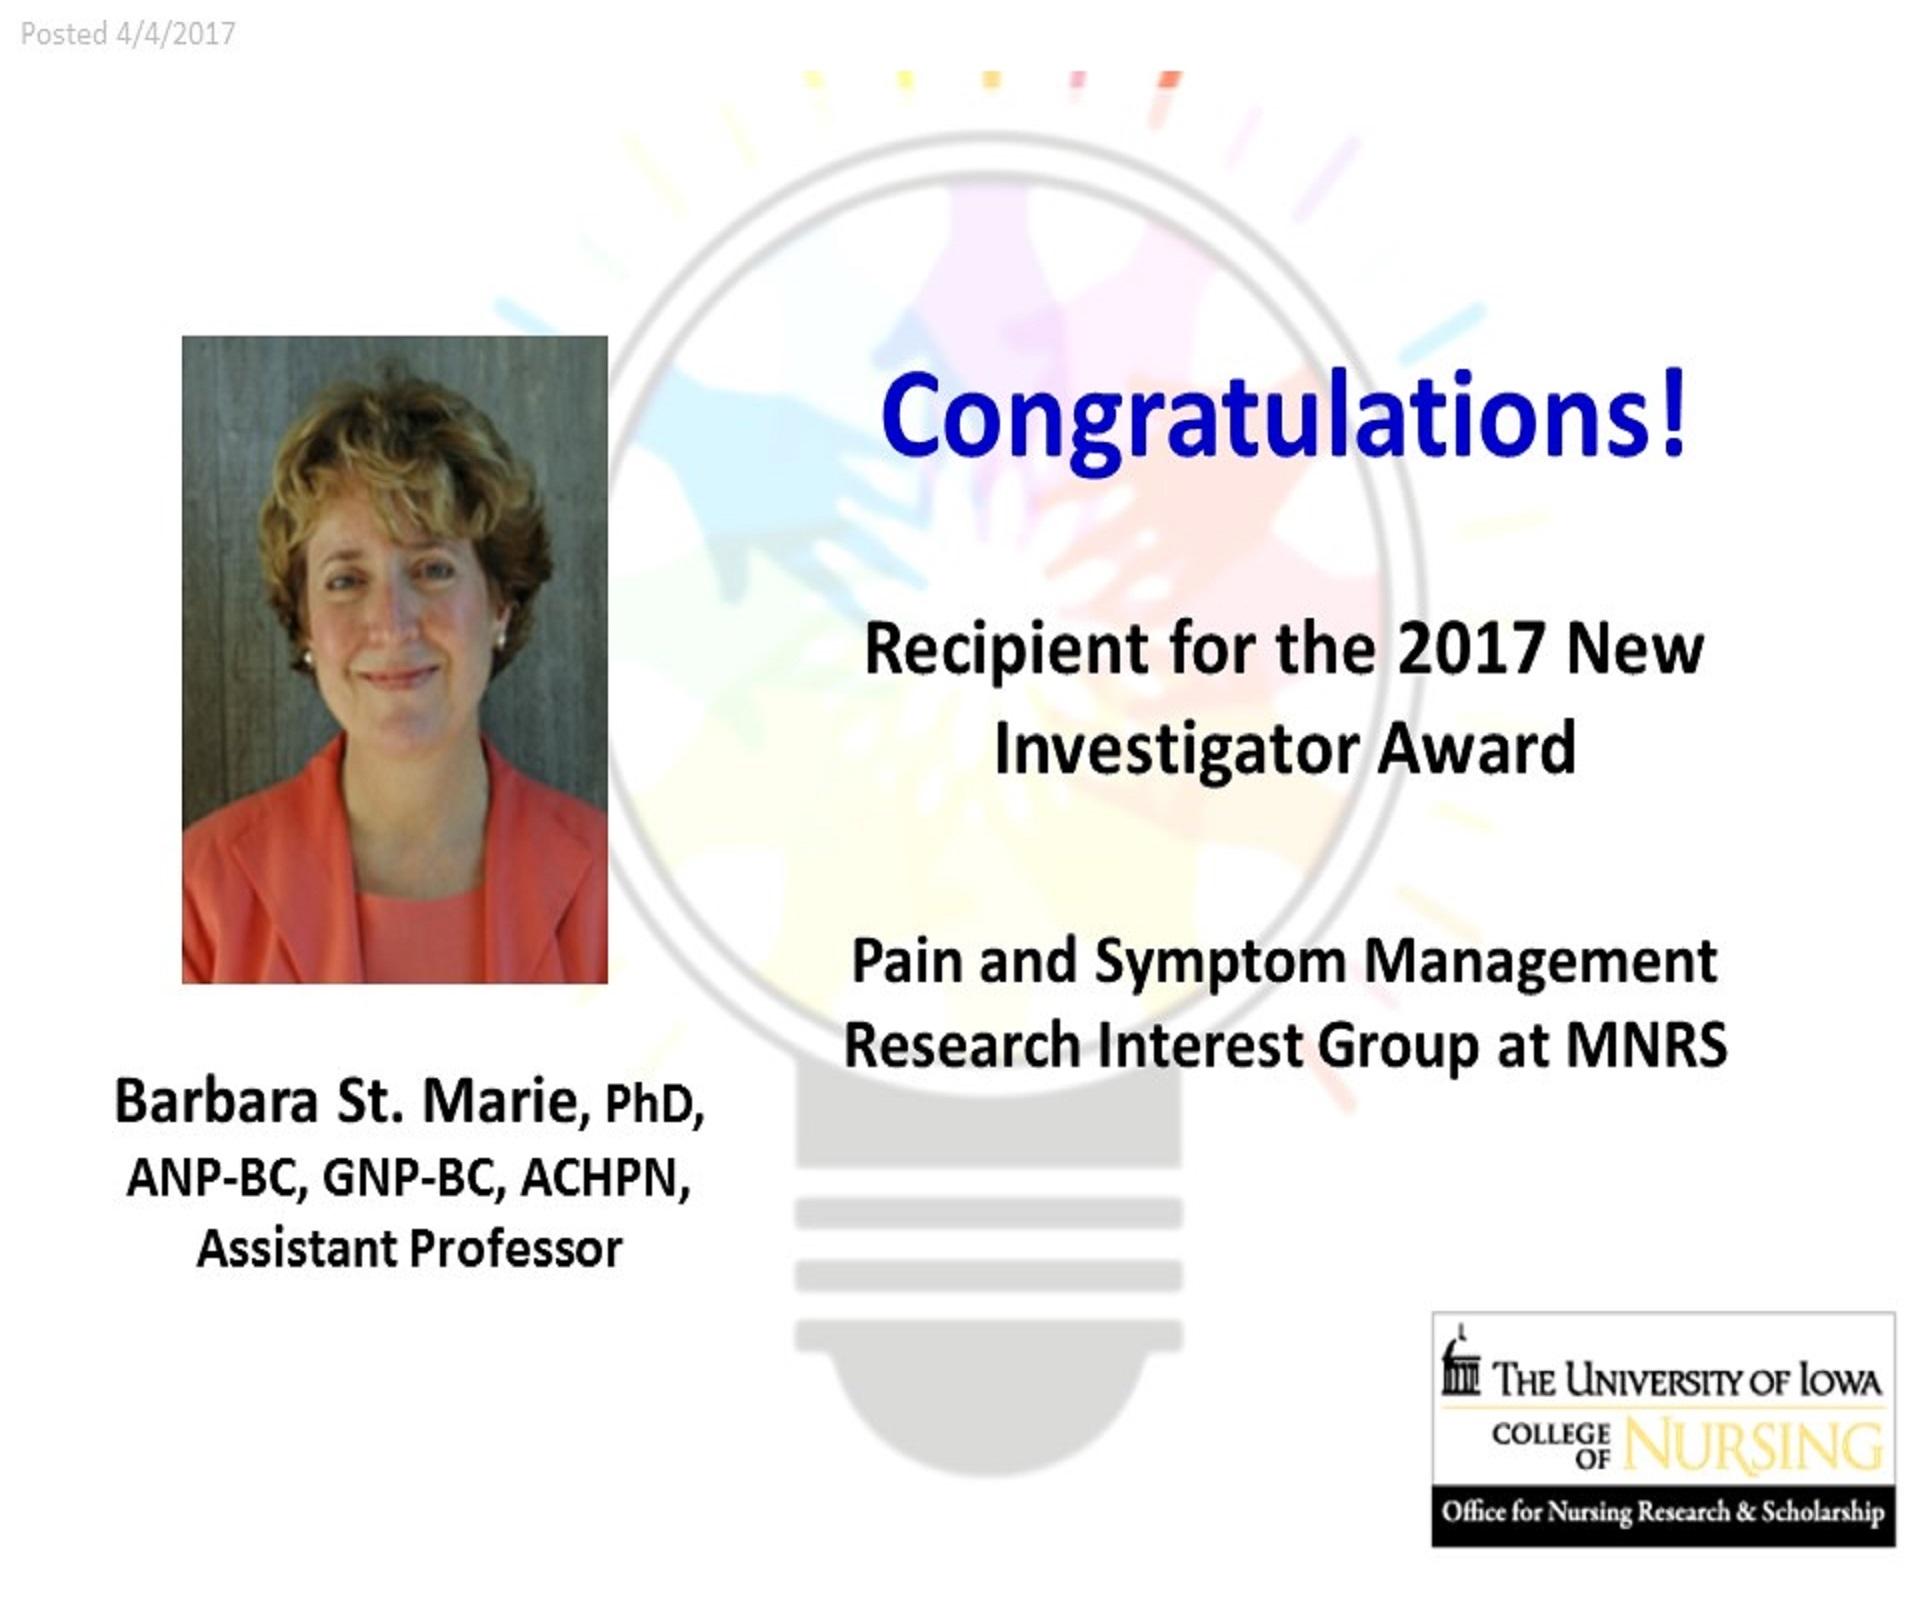 p_St Marie MNRS award-April 2017_1920x1600.jpg